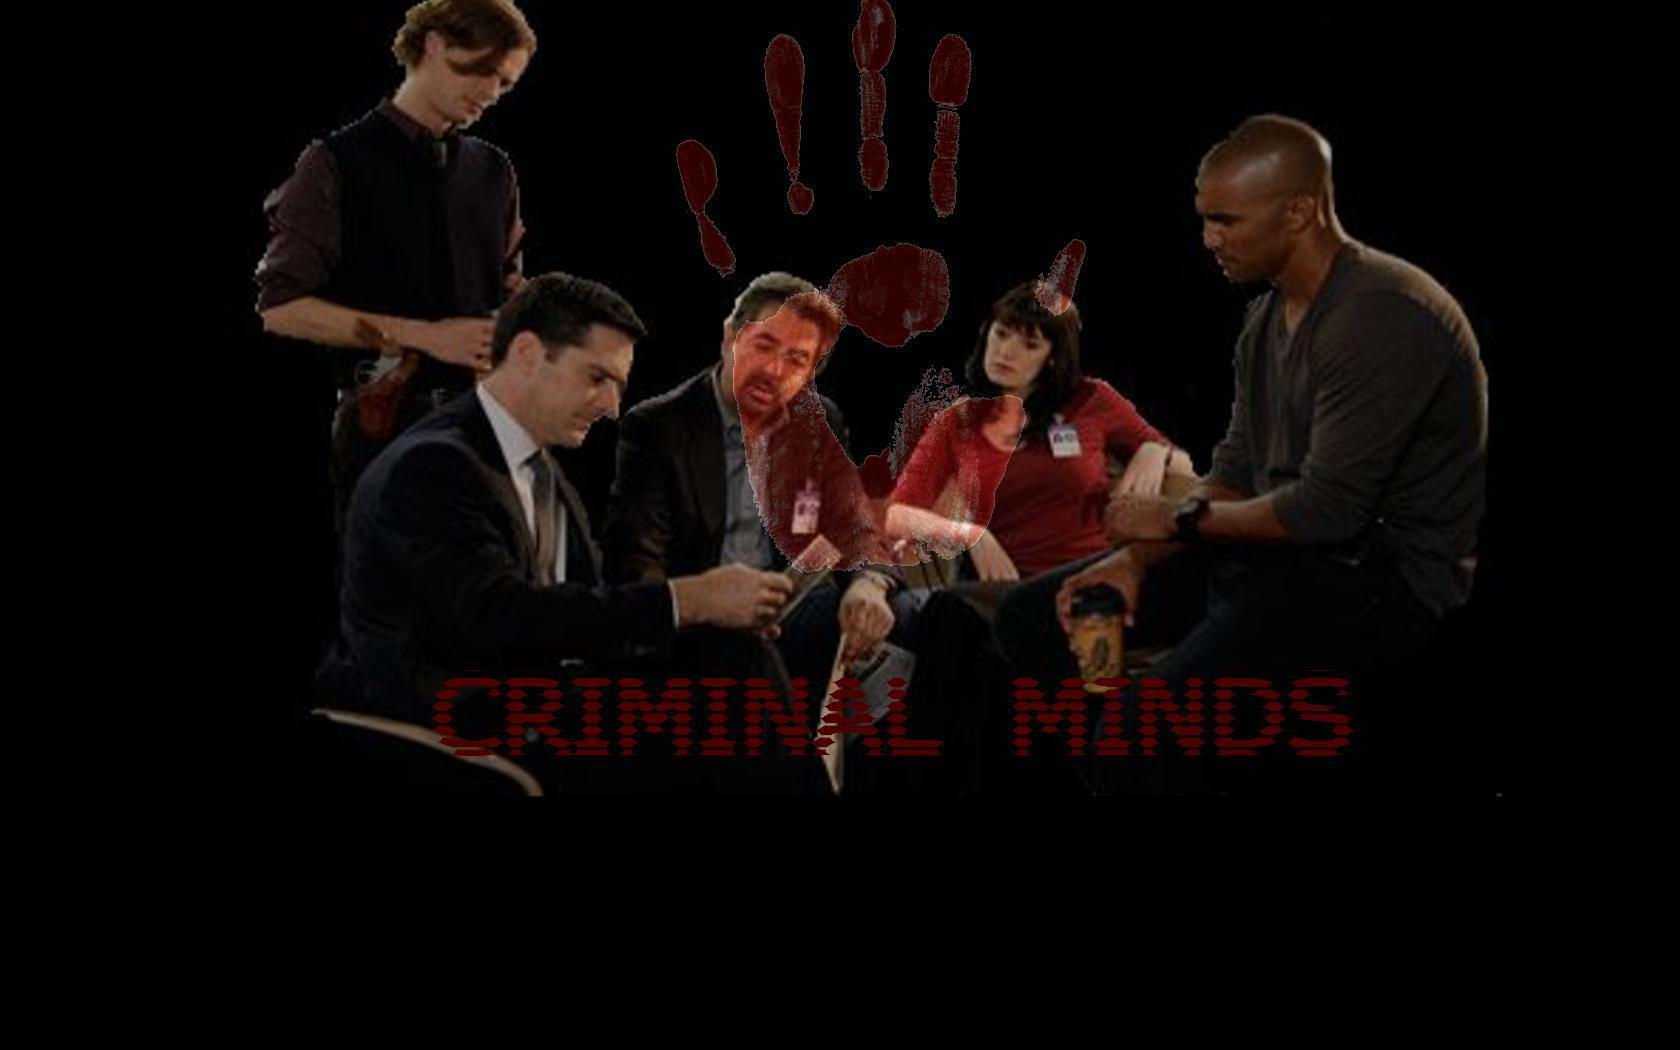 criminal minds criminal minds wallpaper 8661670 fanpop